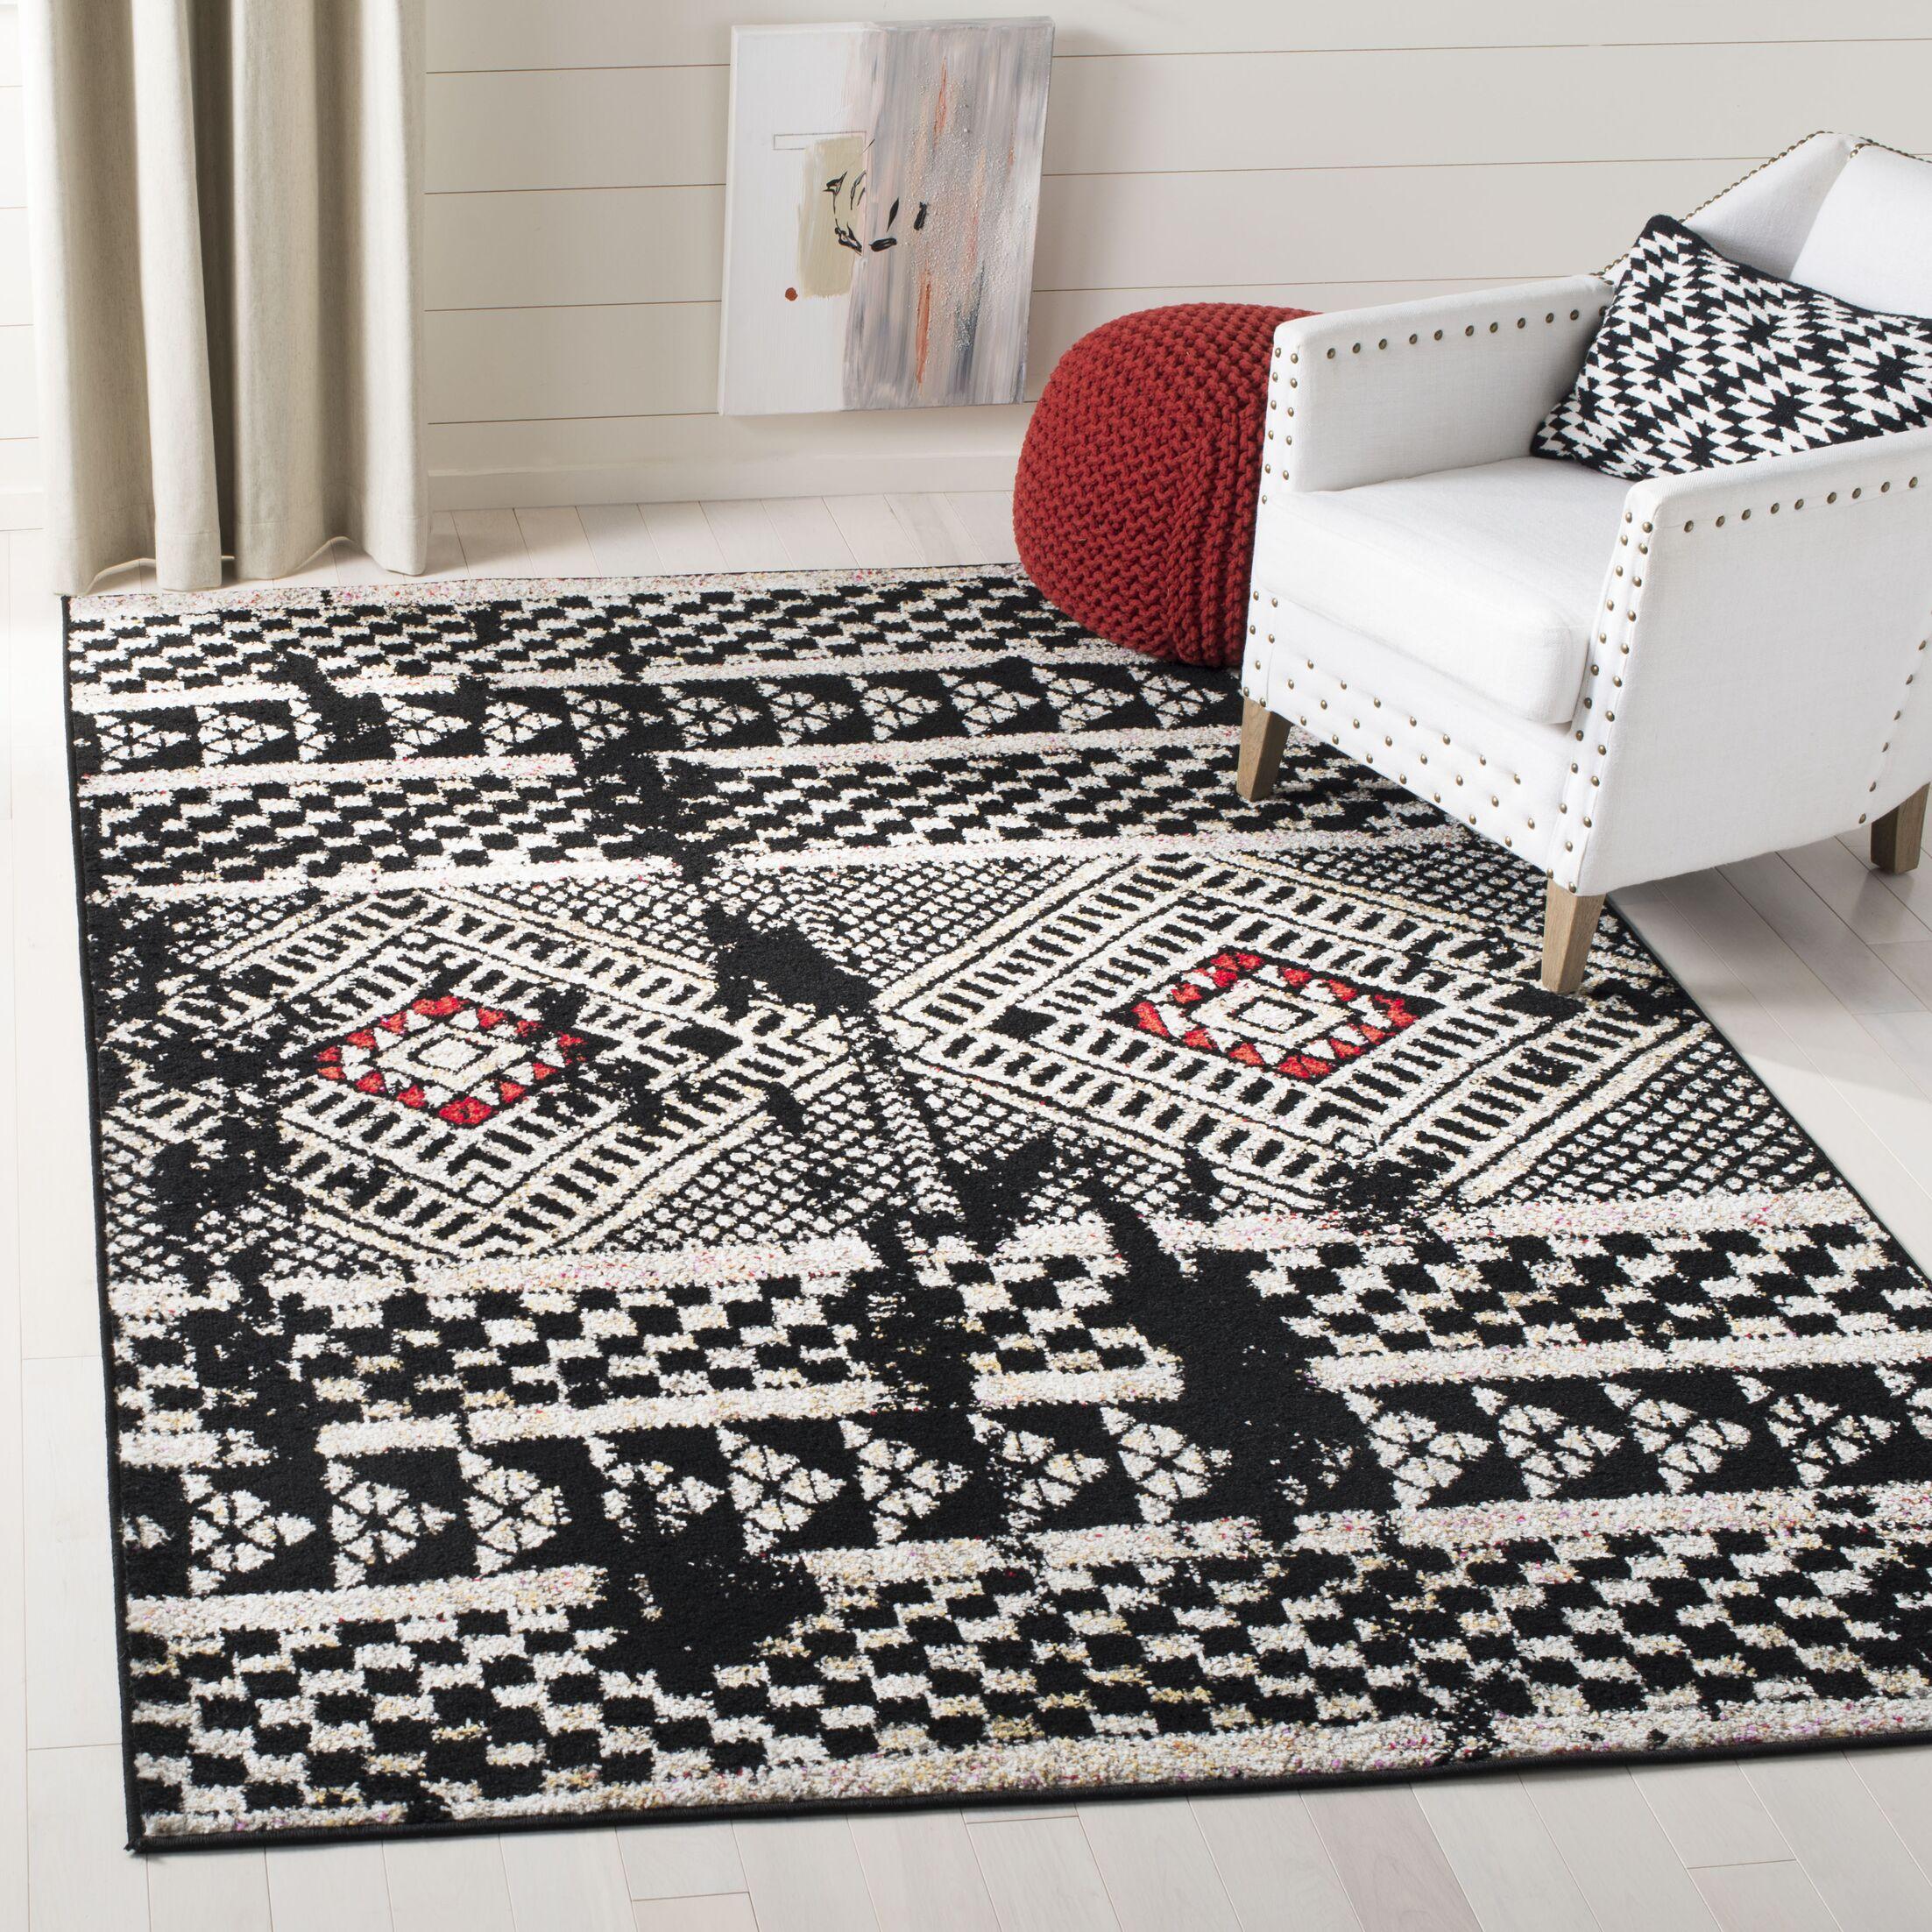 Alisa Black/Light Gray Area Rug Rug Size: Rectangle 6' x 9'